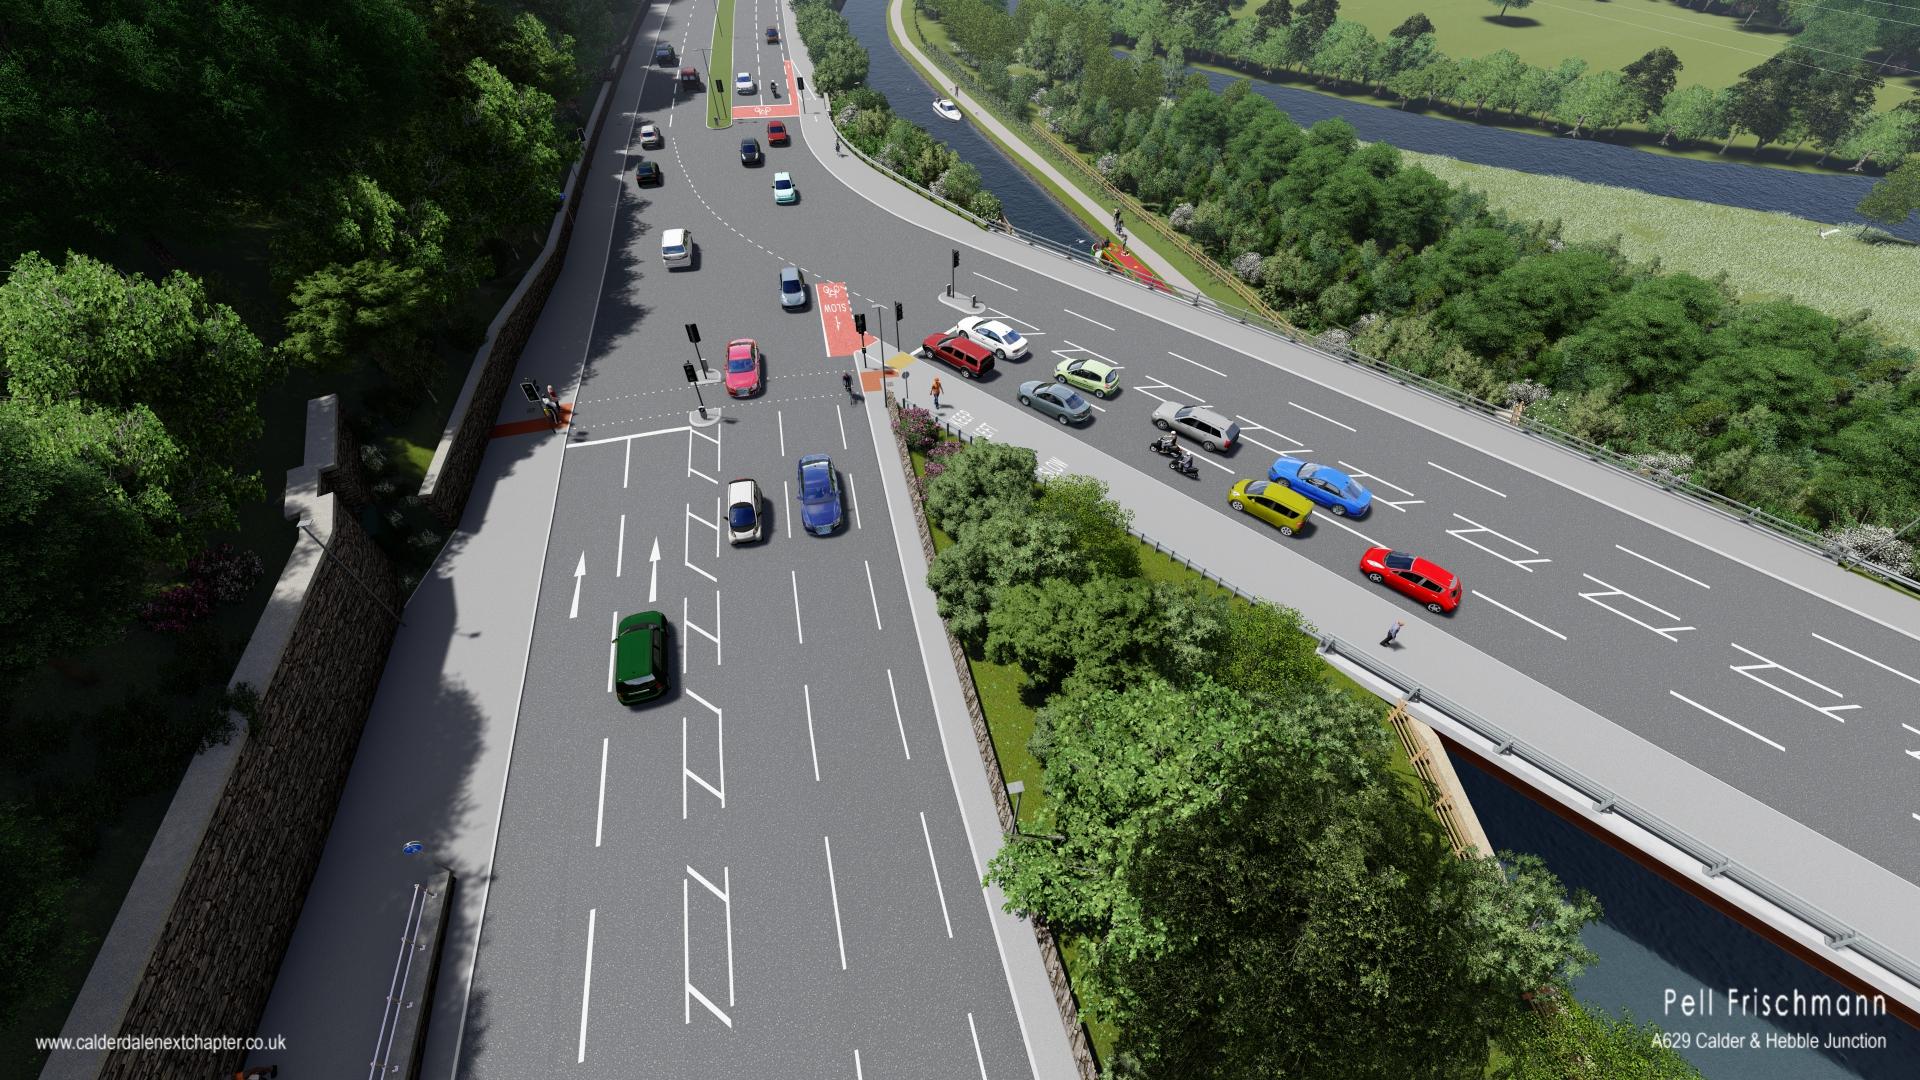 Date for A629 Major Road Improvement scheme Gets Closer!